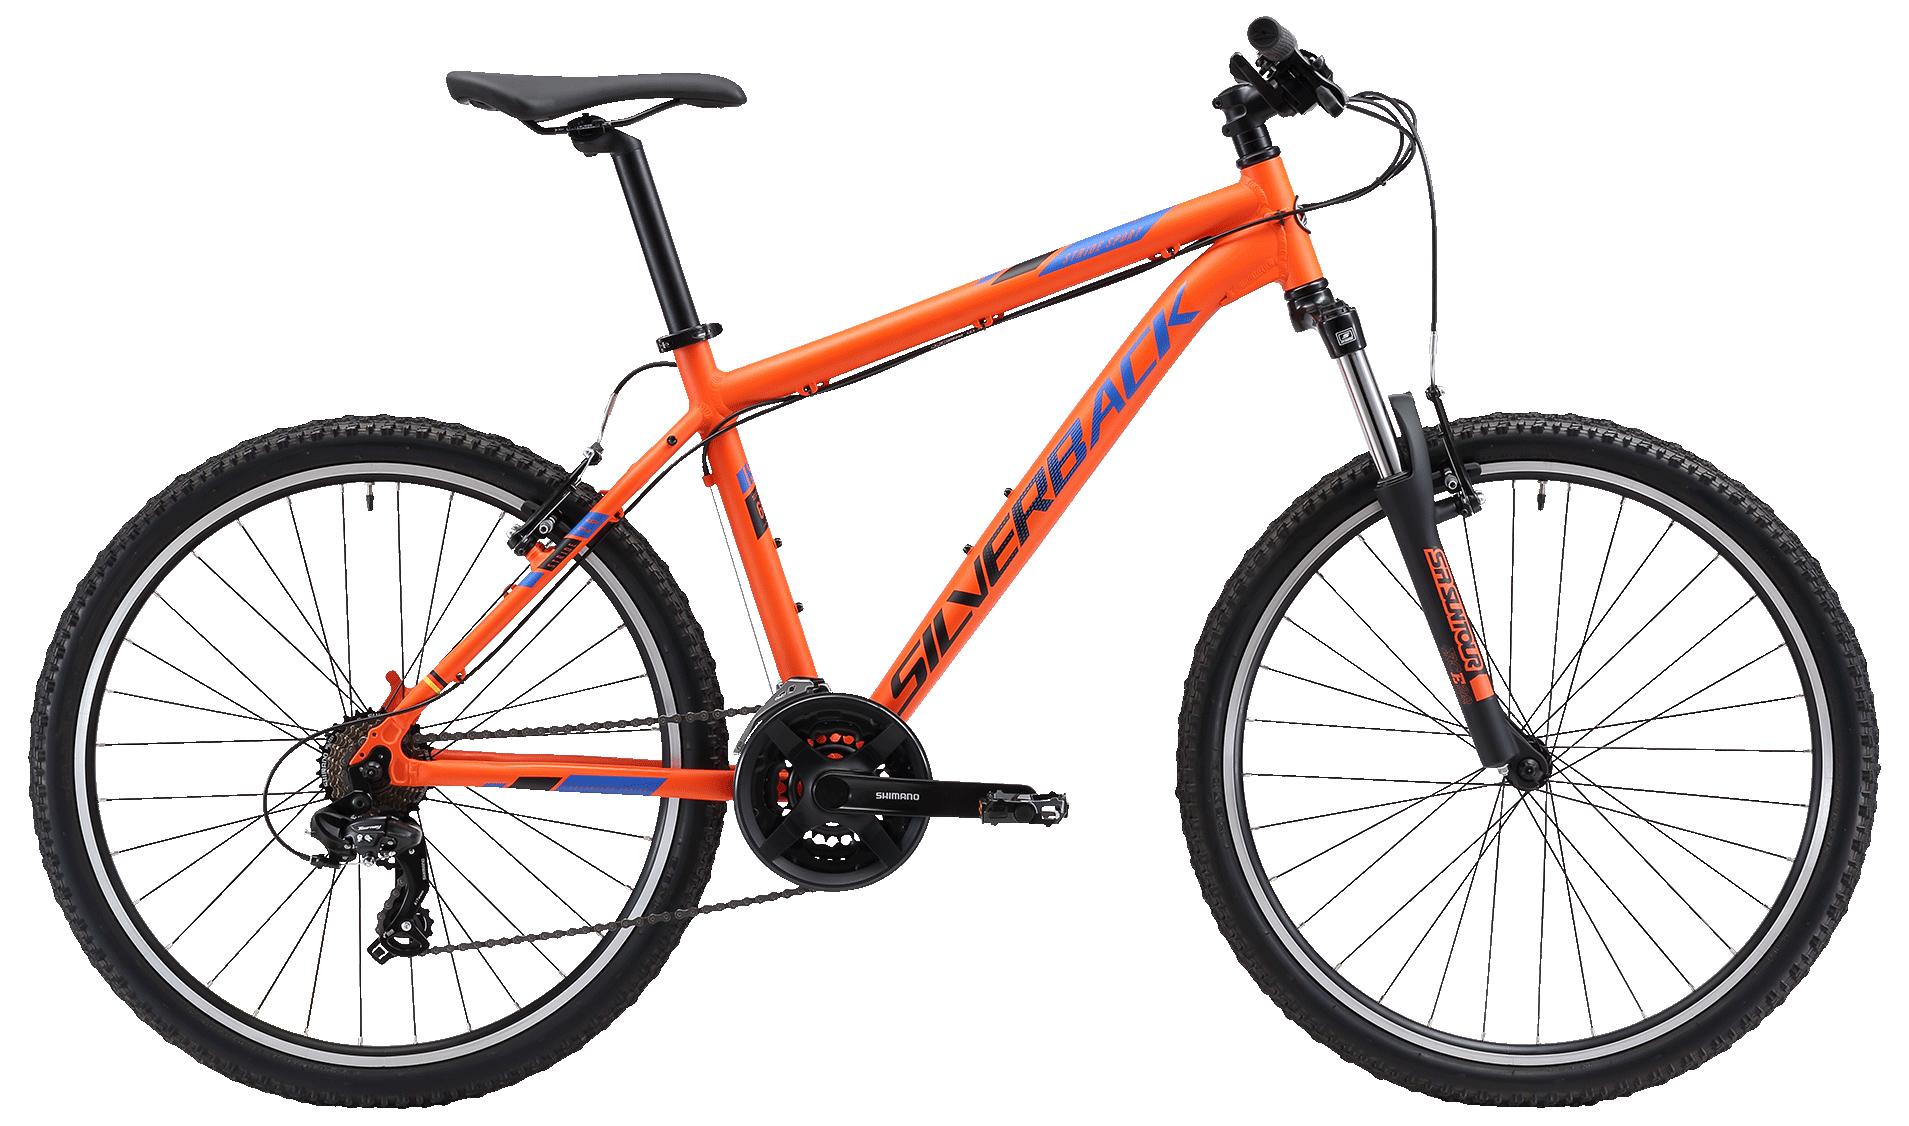 Велосипед Silverback Stride 26 Sport 2019 велосипед silverback stride fatty 2018